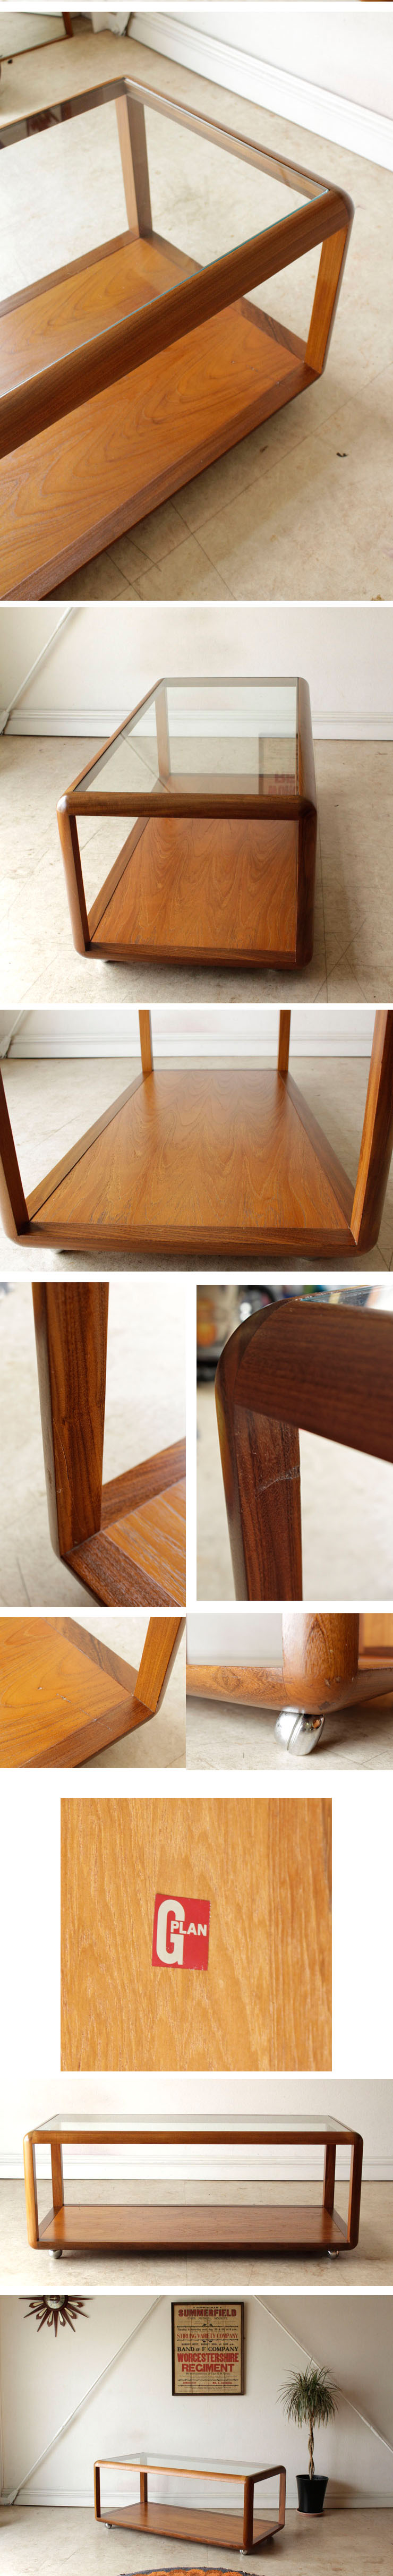 G-plan・ジープラン・ガラステーブル・コーヒーテーブル・センターテーブル・チーク・ビンテージ・アンティーク・北欧